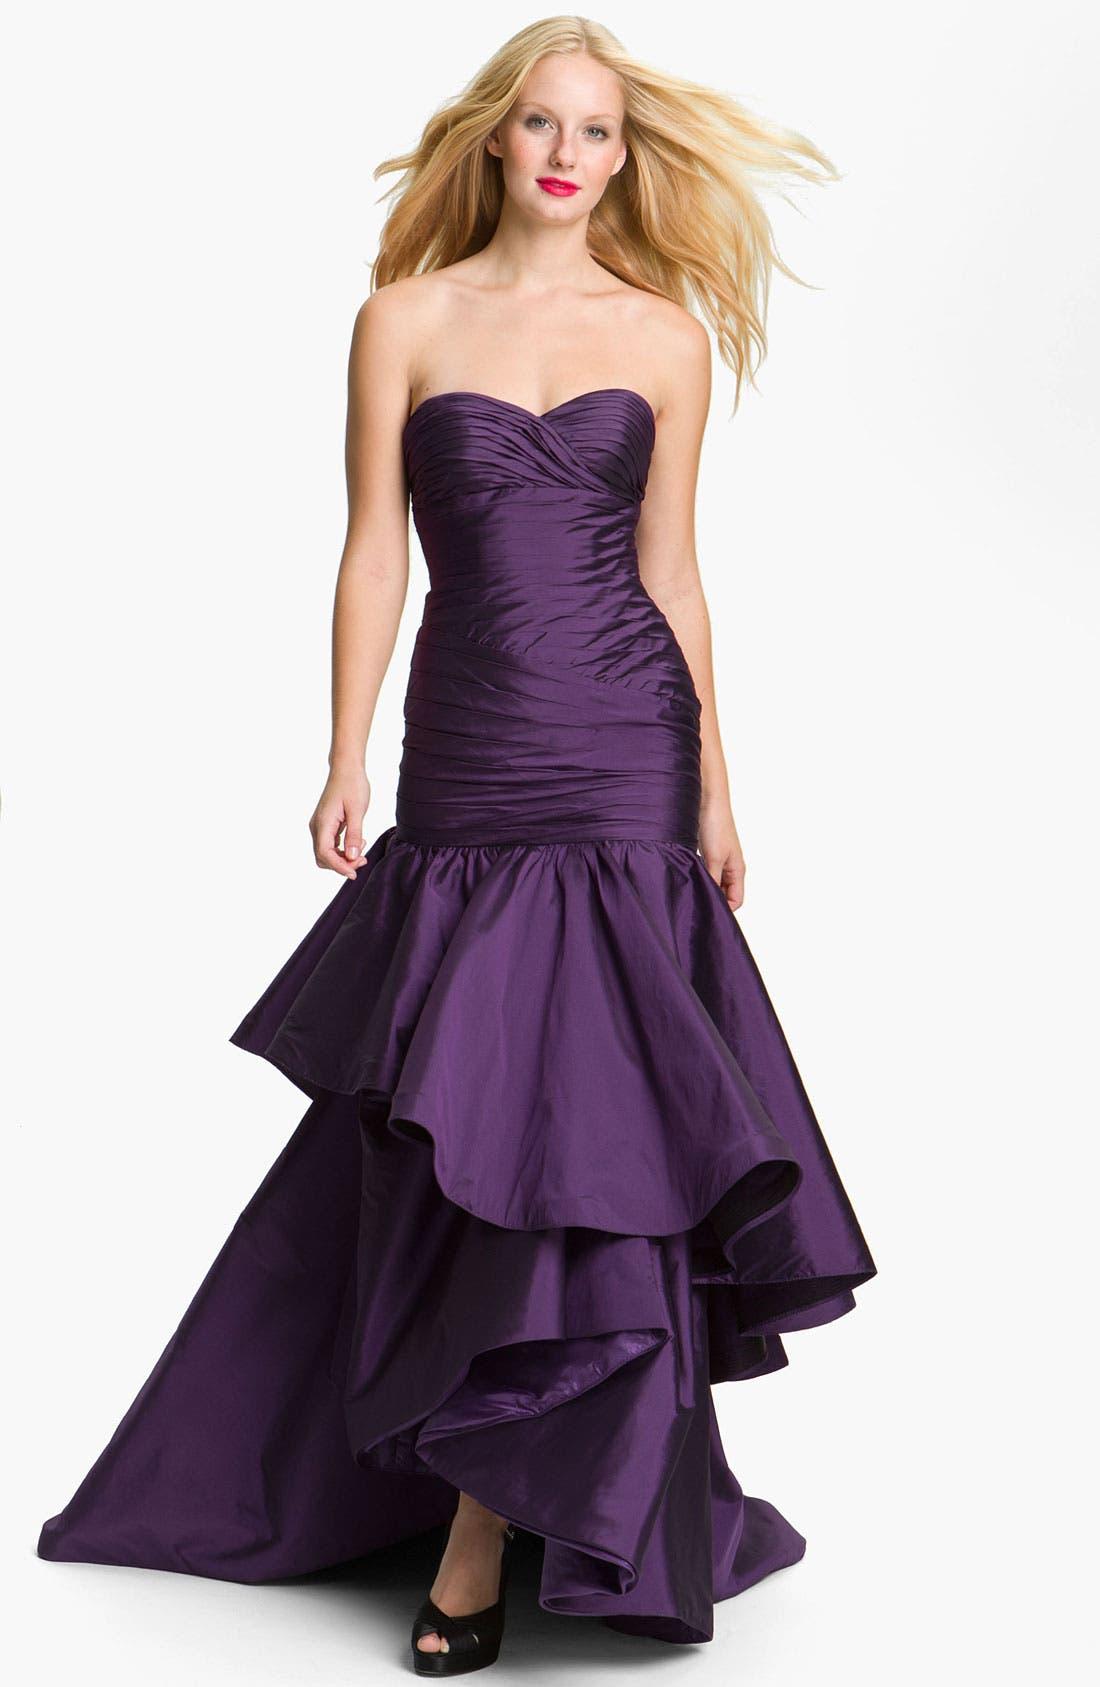 Main Image - ML Monique Lhuillier Strapless High/Low Taffeta Mermaid Gown